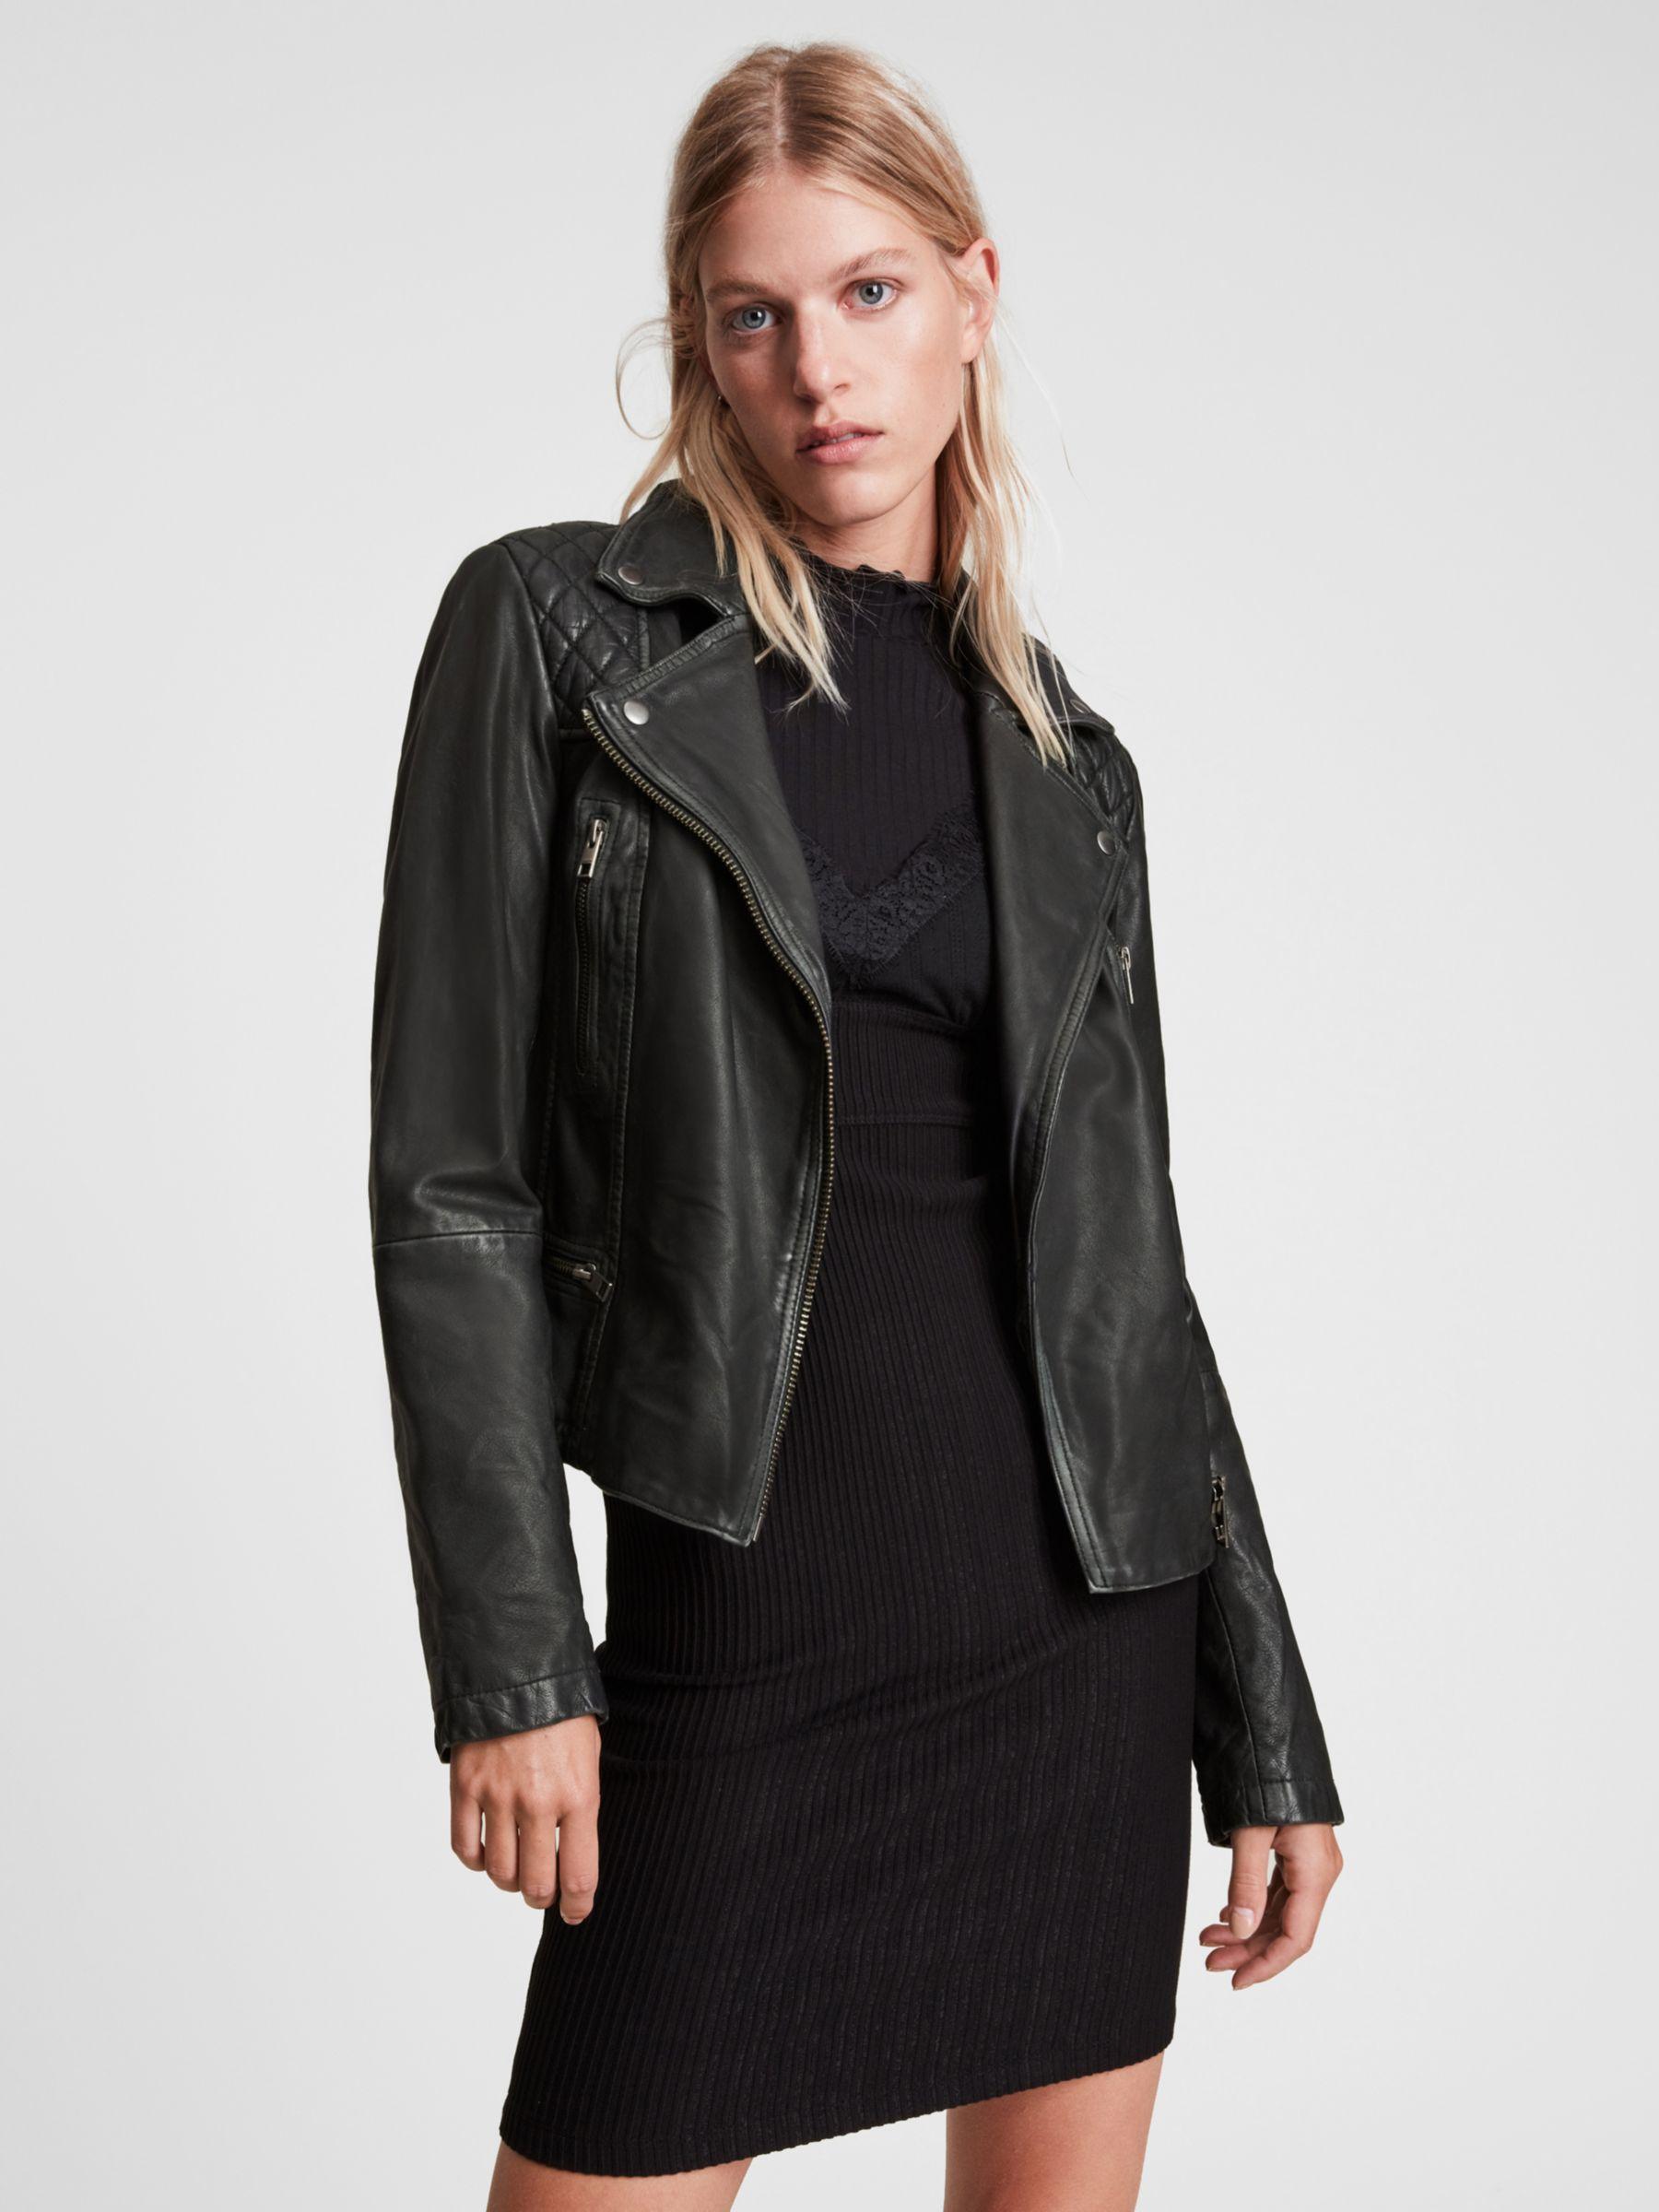 AllSaints AllSaints Leather Cargo Biker Jacket, Black/Grey